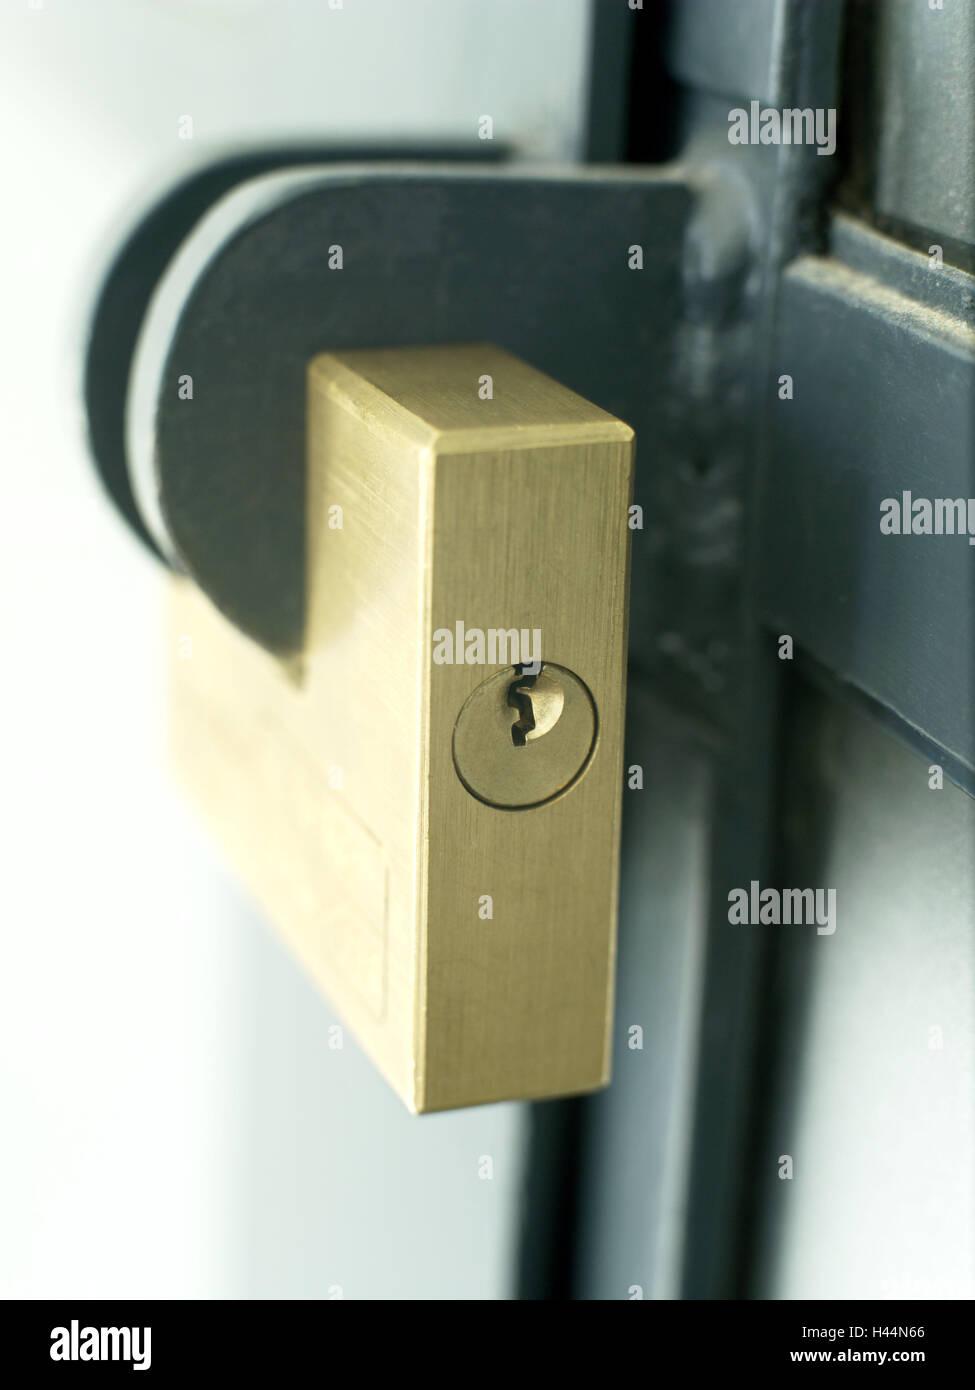 Türschloss Sicherheit sperren tür fertig einbruch schließen verschluss schutz